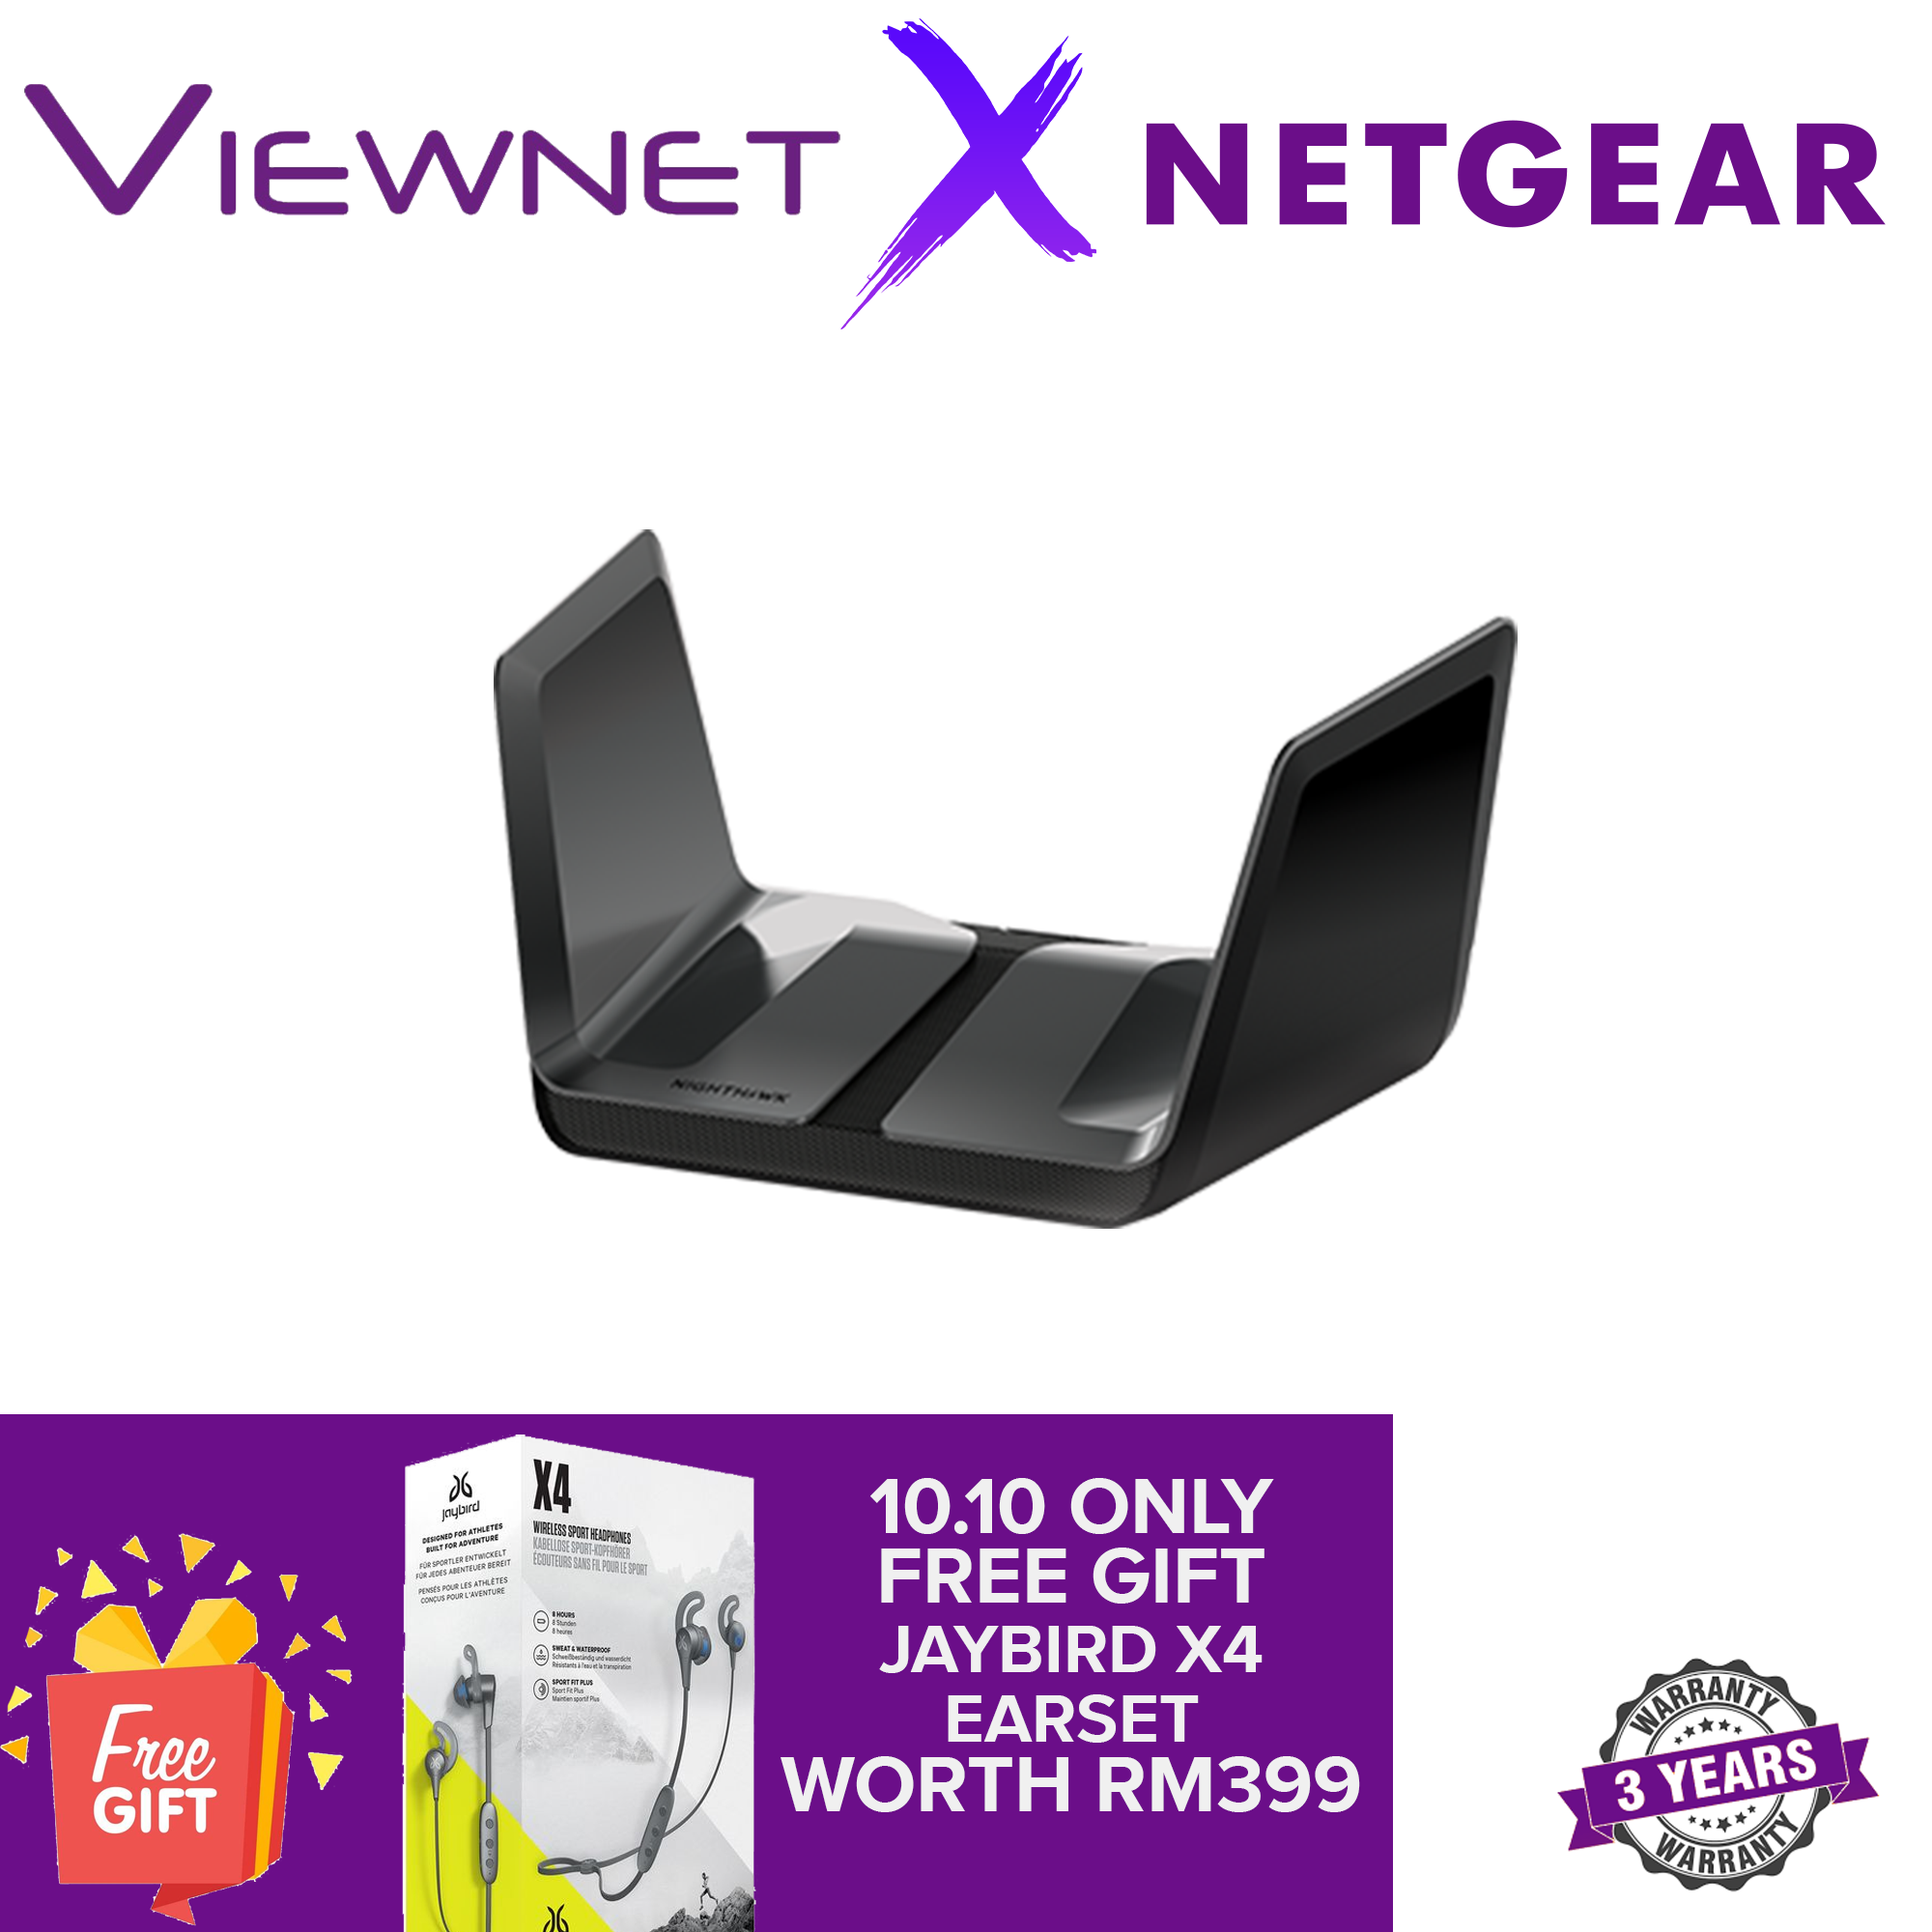 Netgear Nighthawk AX8 8-Stream AX6000 WiFi 6 Router RAX80-100EUS - High Performance Antennas 512MB RAM Quad-Core 1.8Ghz CPU